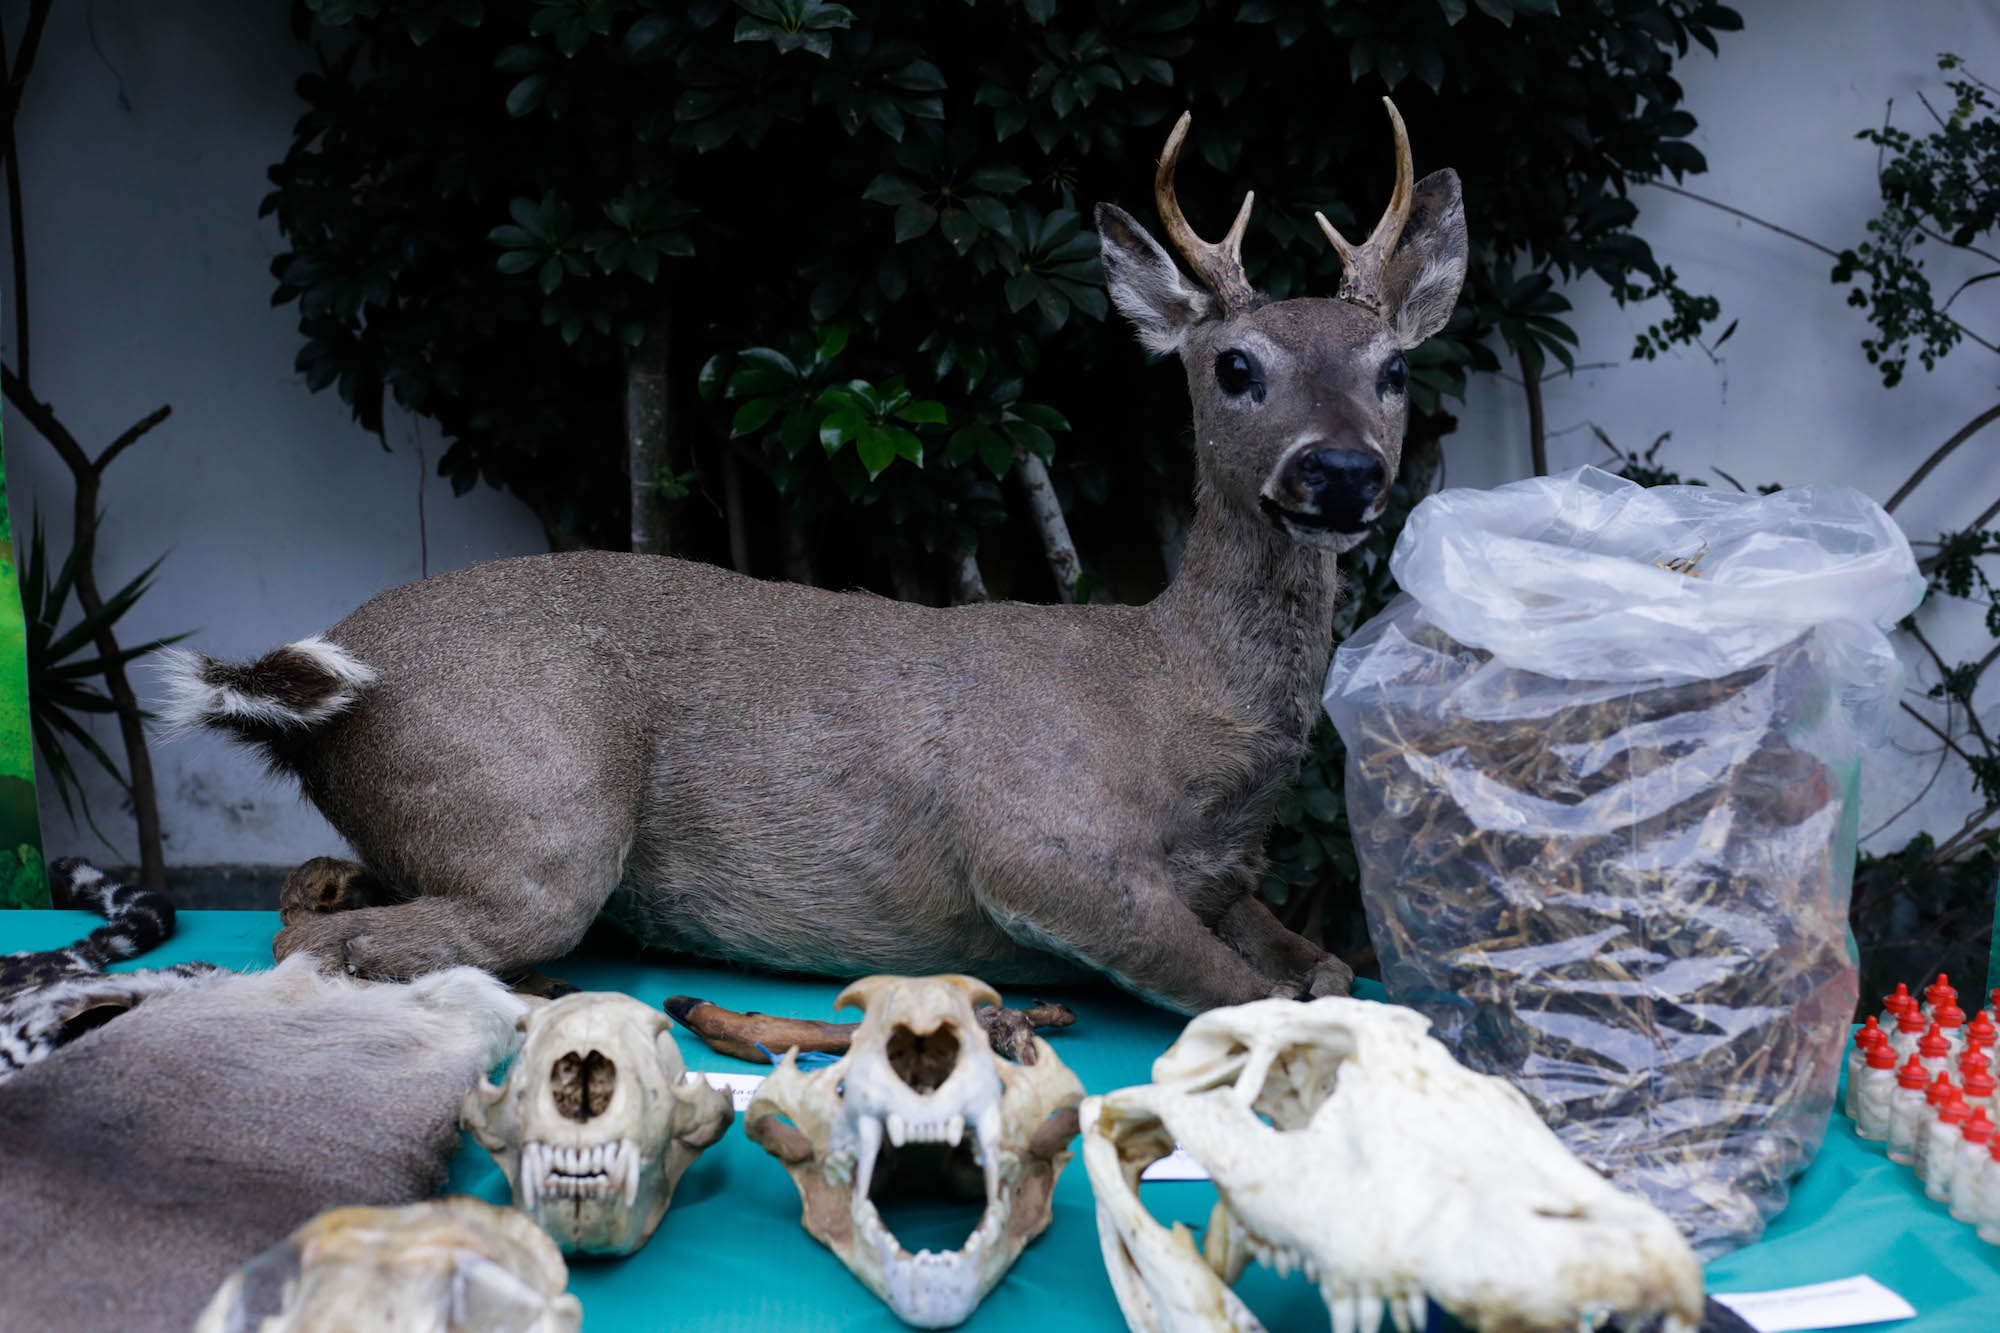 Las partes de animales silvestres son utilizados en rituales chamánicos. Foto: Serfor.